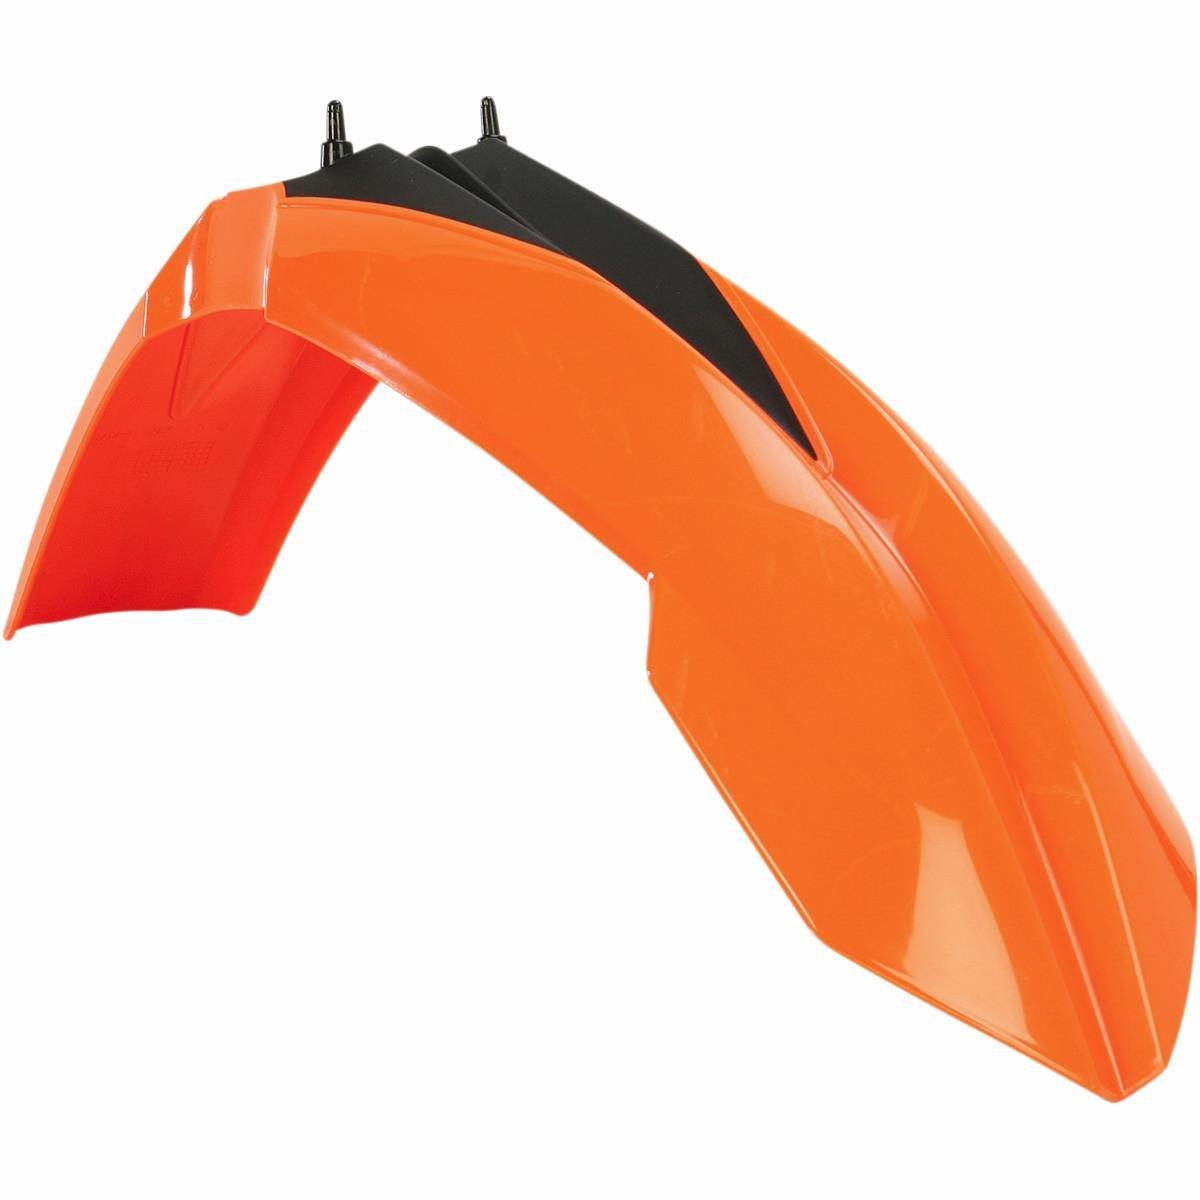 'Acerbis guardabarros delantero –  naranja 0016886.010